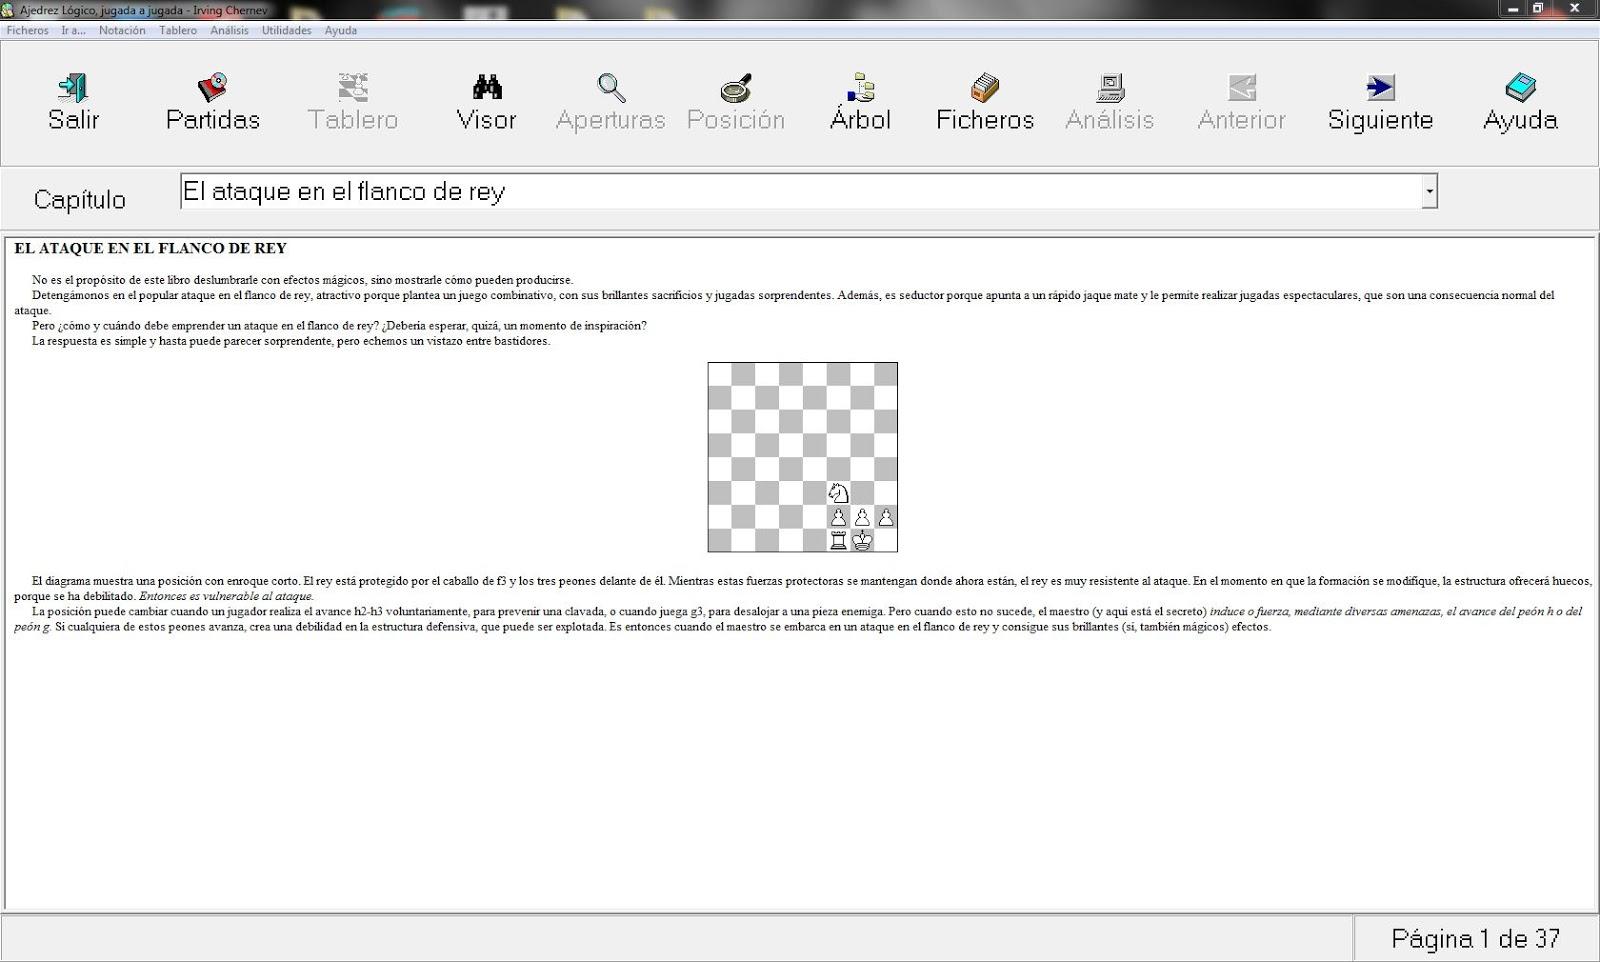 Chernev epub ajedrez download irving logico